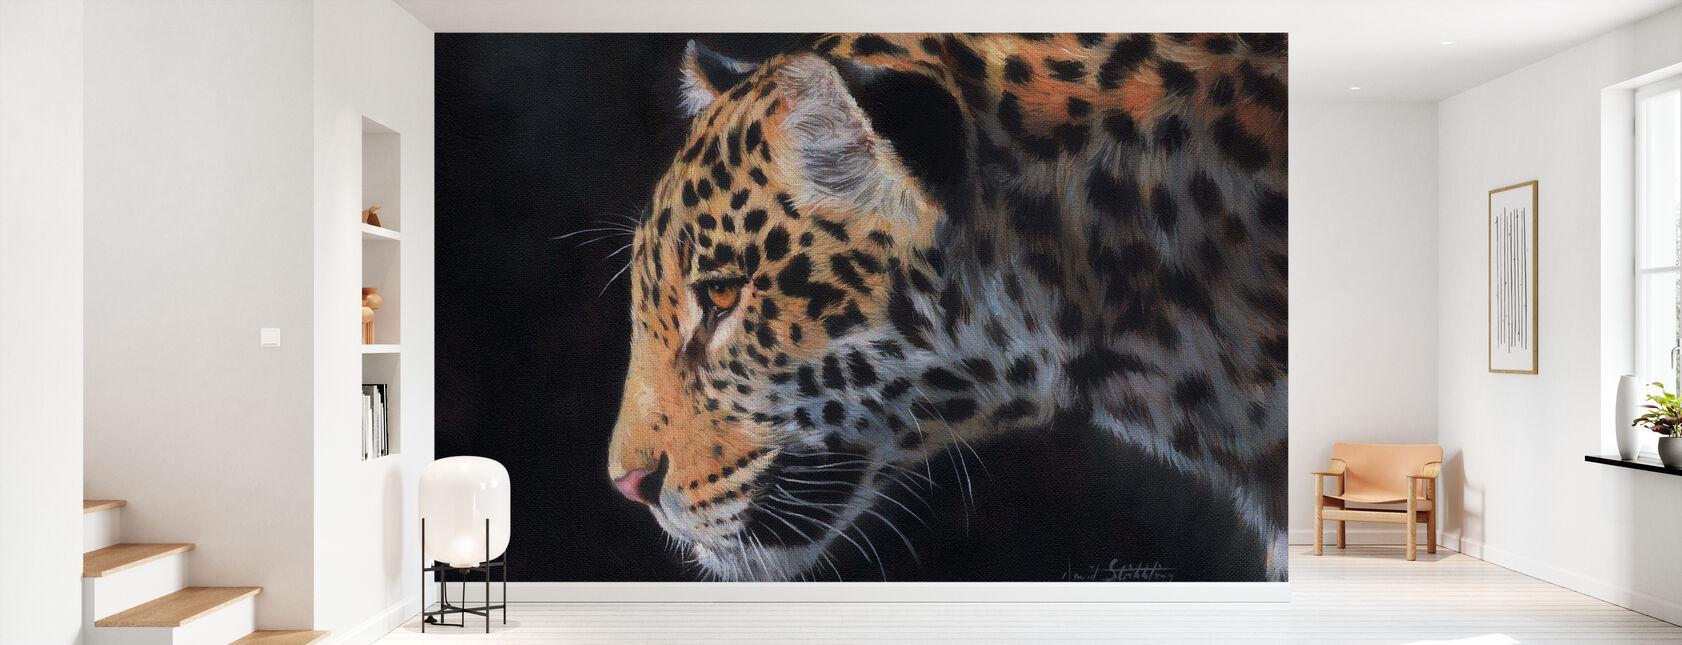 Jaguar Portrait - Wallpaper - Hallway